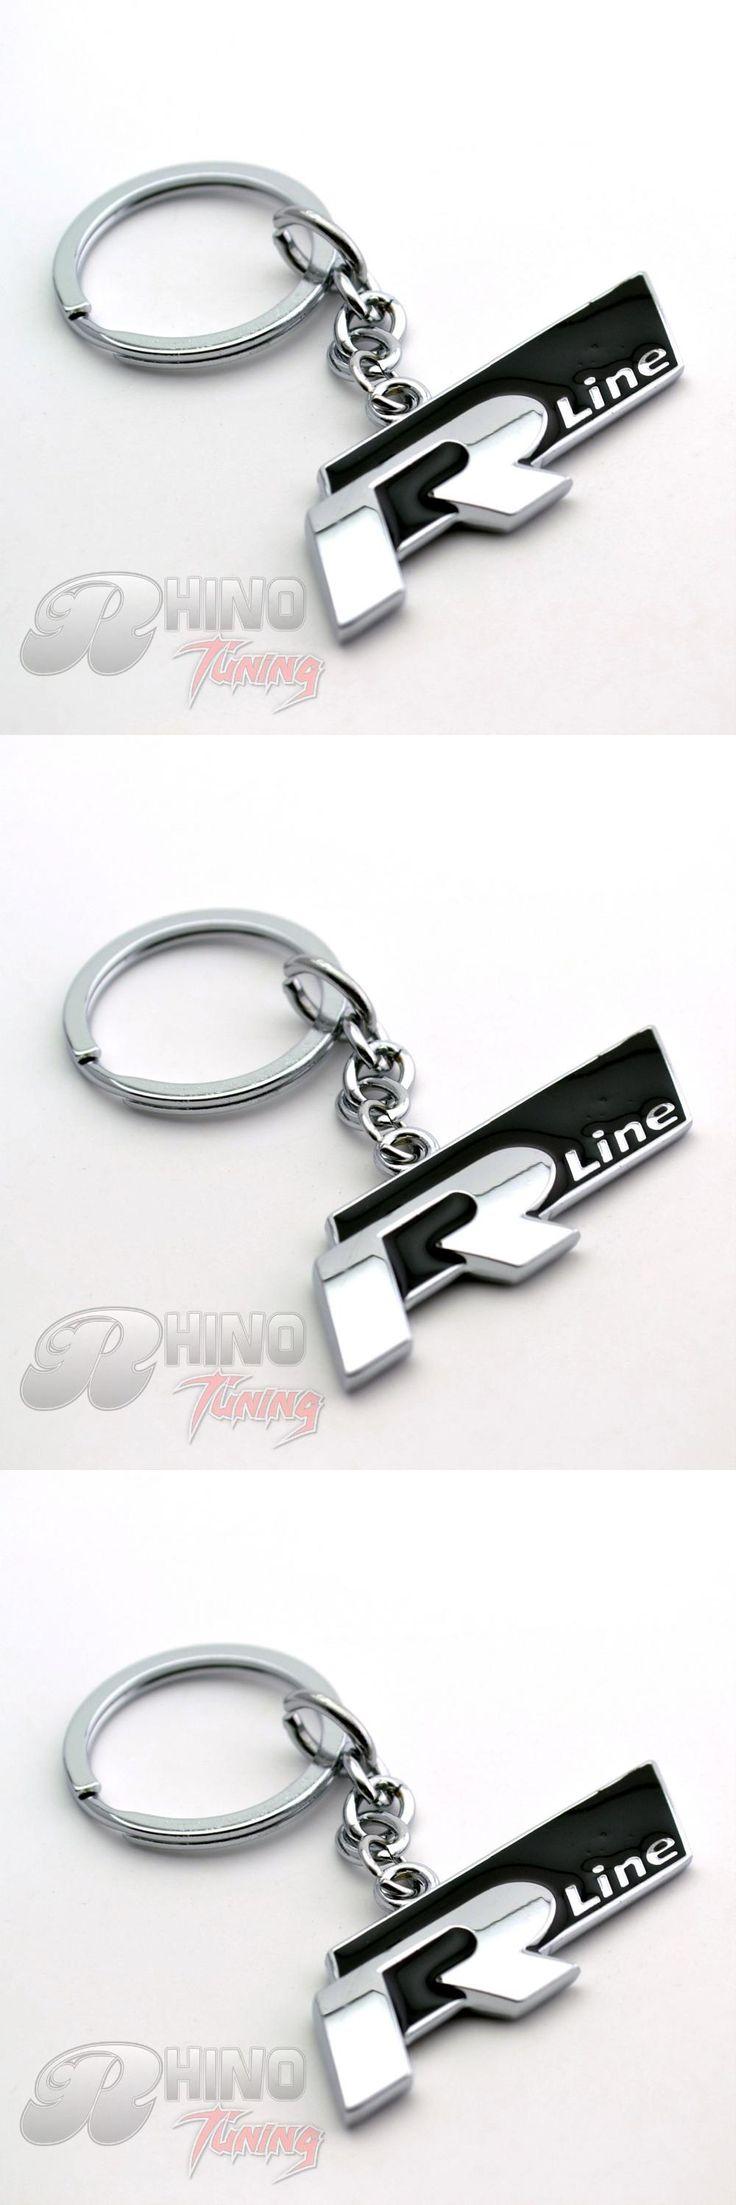 [Visit to Buy] Rhino Tuning High Quality Metal R Line Car Key Ring for GOLF 6 GOLF 7 MK5 MK6 MK7 Polo Car Key Chain Auto Accessory 220bk #Advertisement